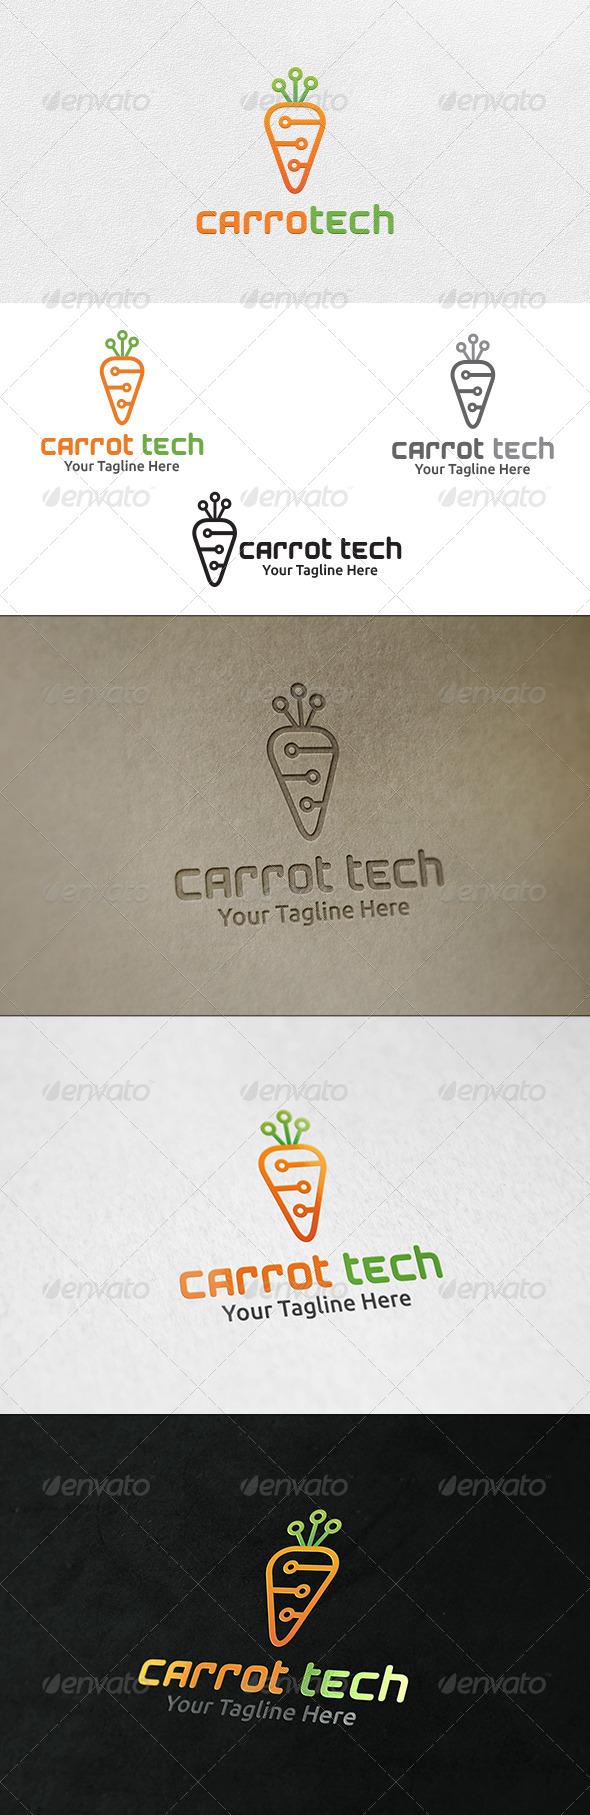 GraphicRiver Carrot Tech Logo Template 6491710